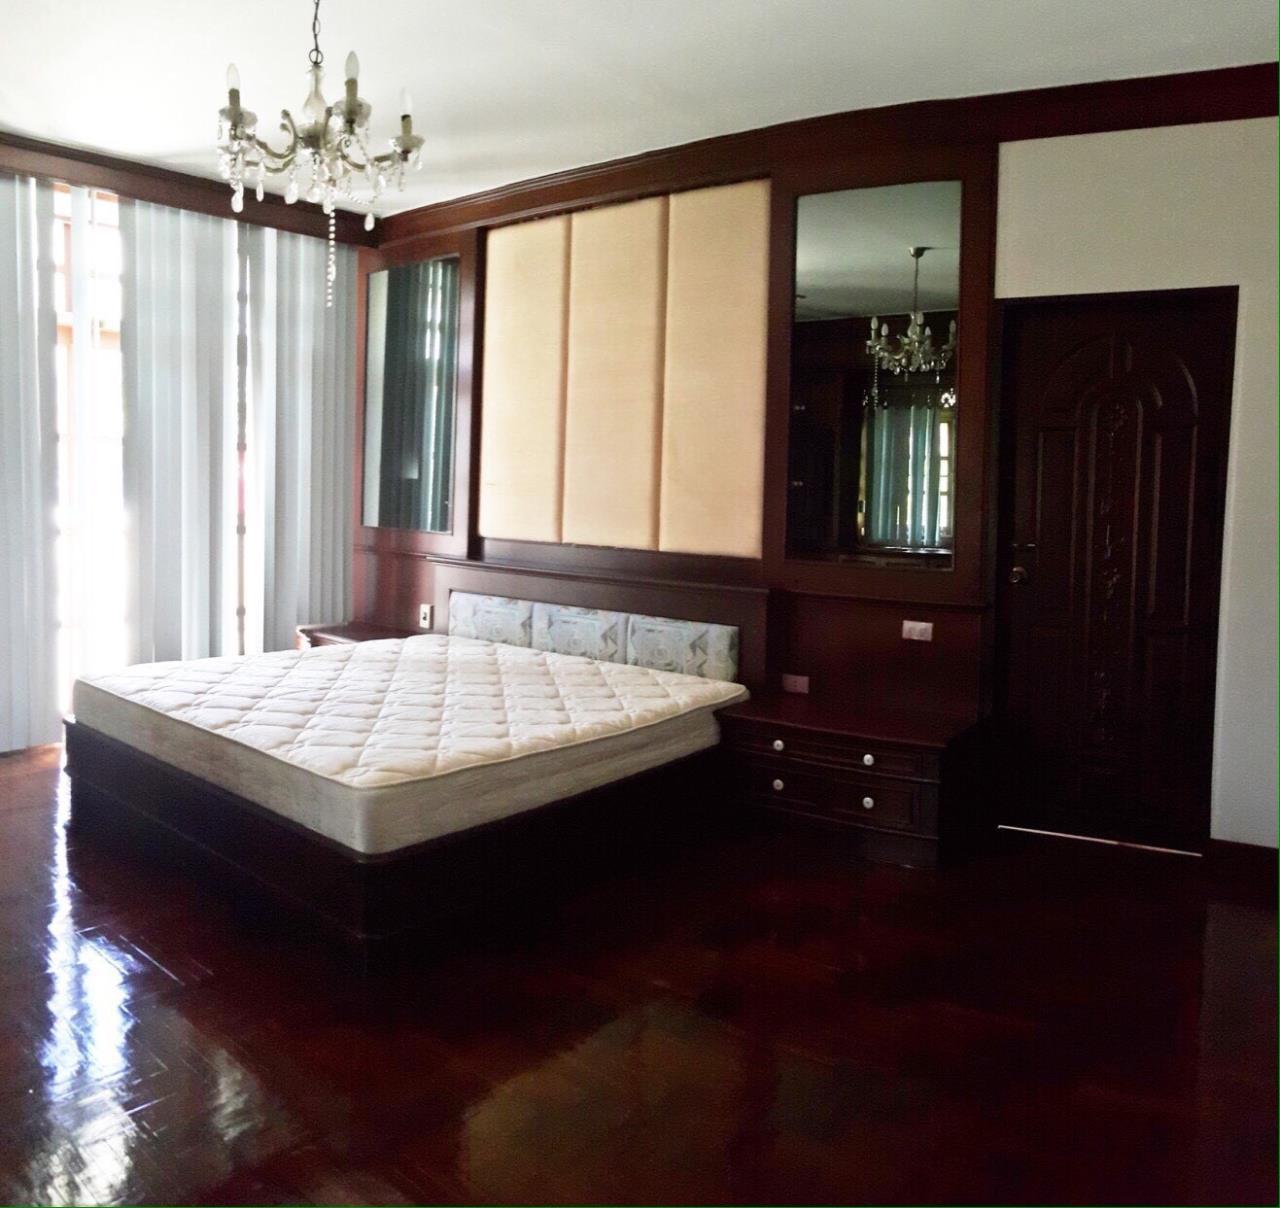 RE/MAX Properties Agency's Baan Suan srinakarindra 9